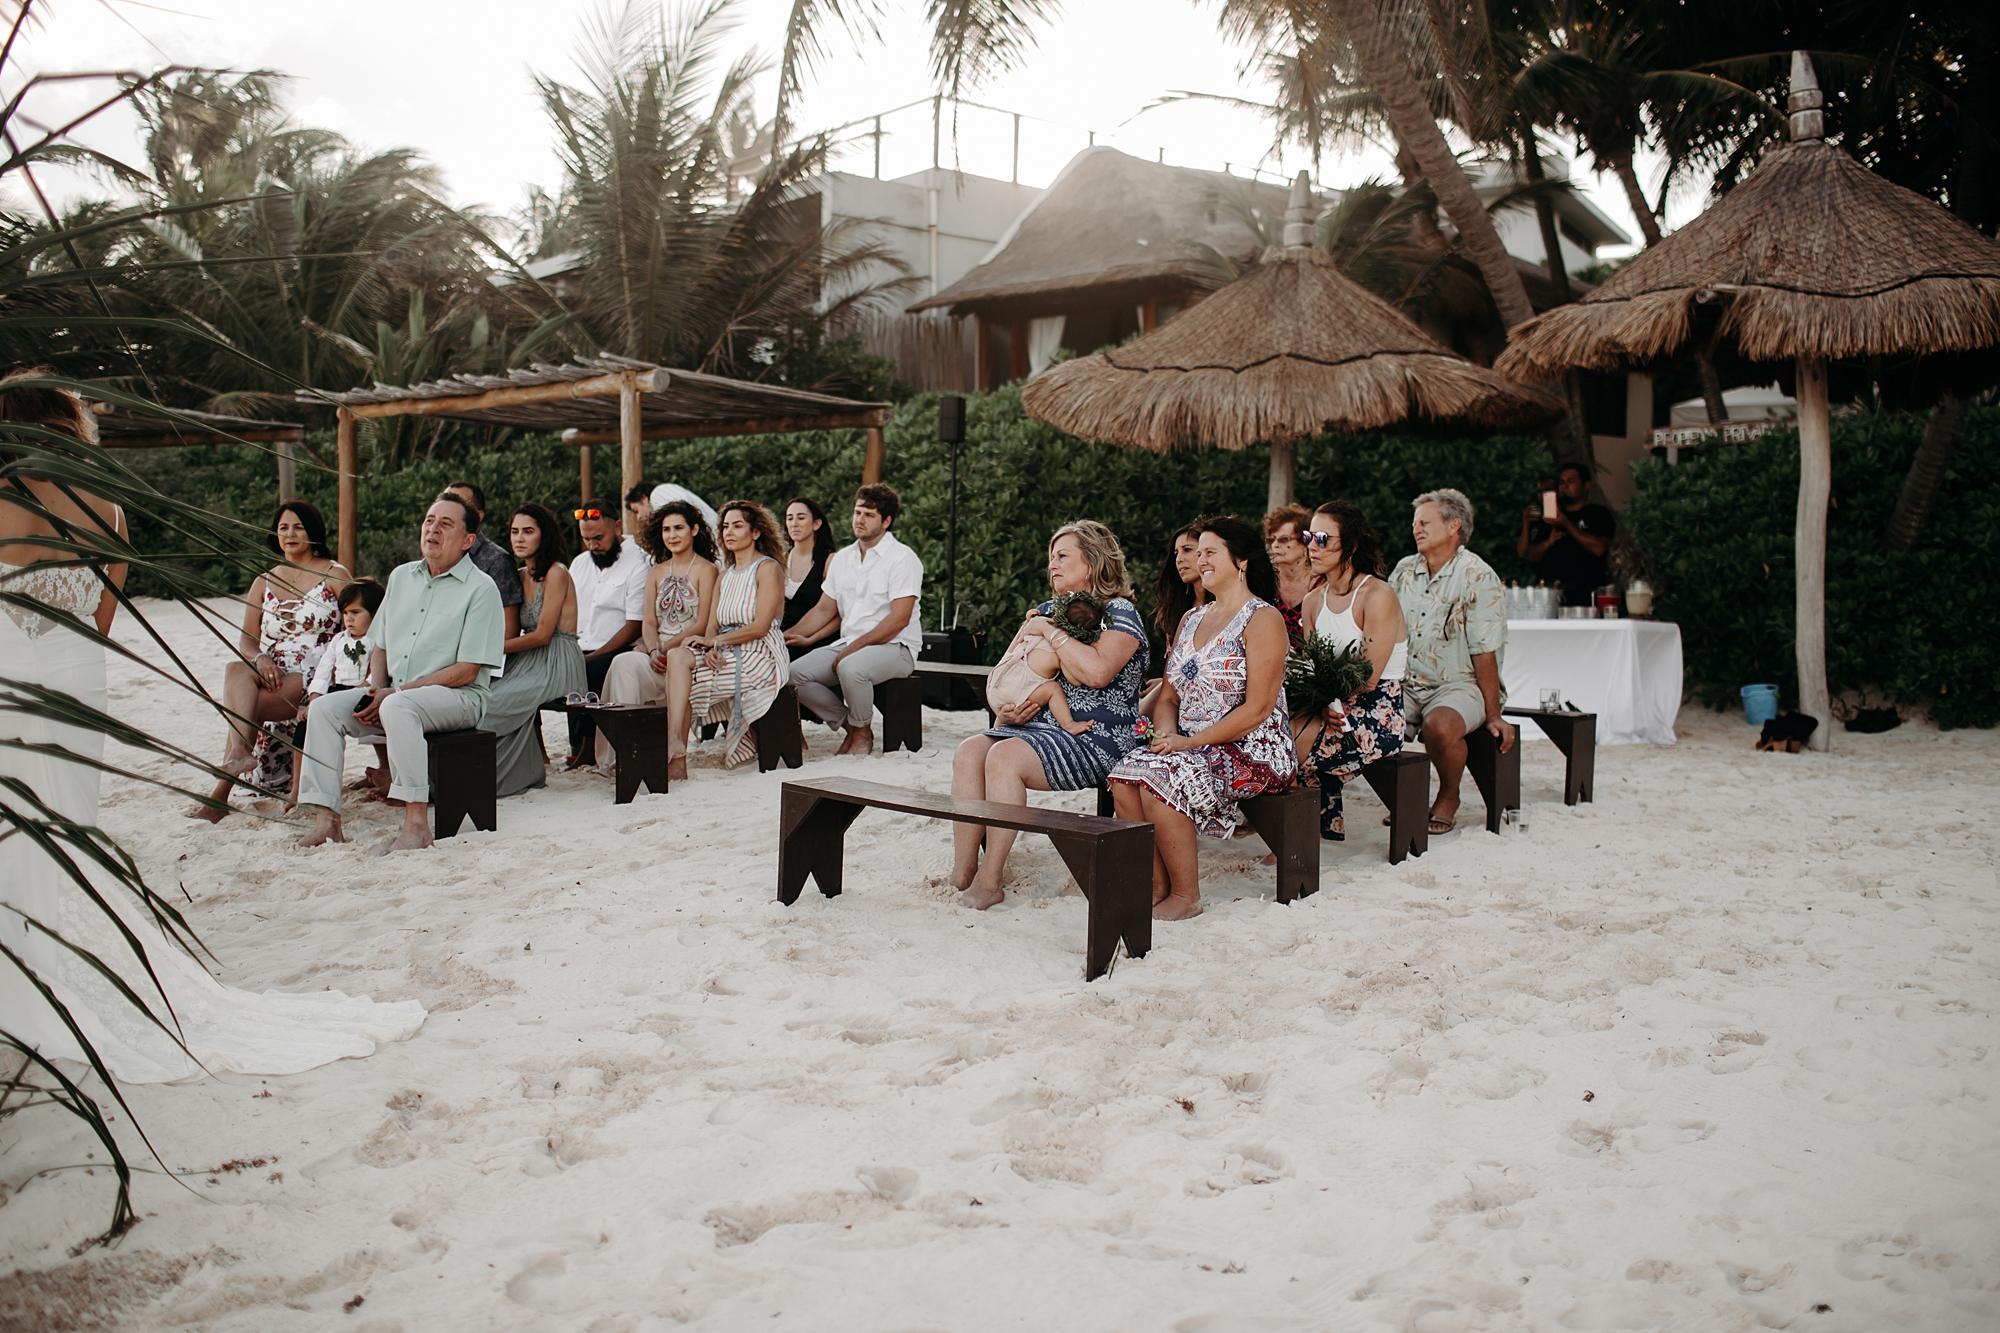 Danielle-San-Antonio-Wedding-Photographer-160_WEB.jpg